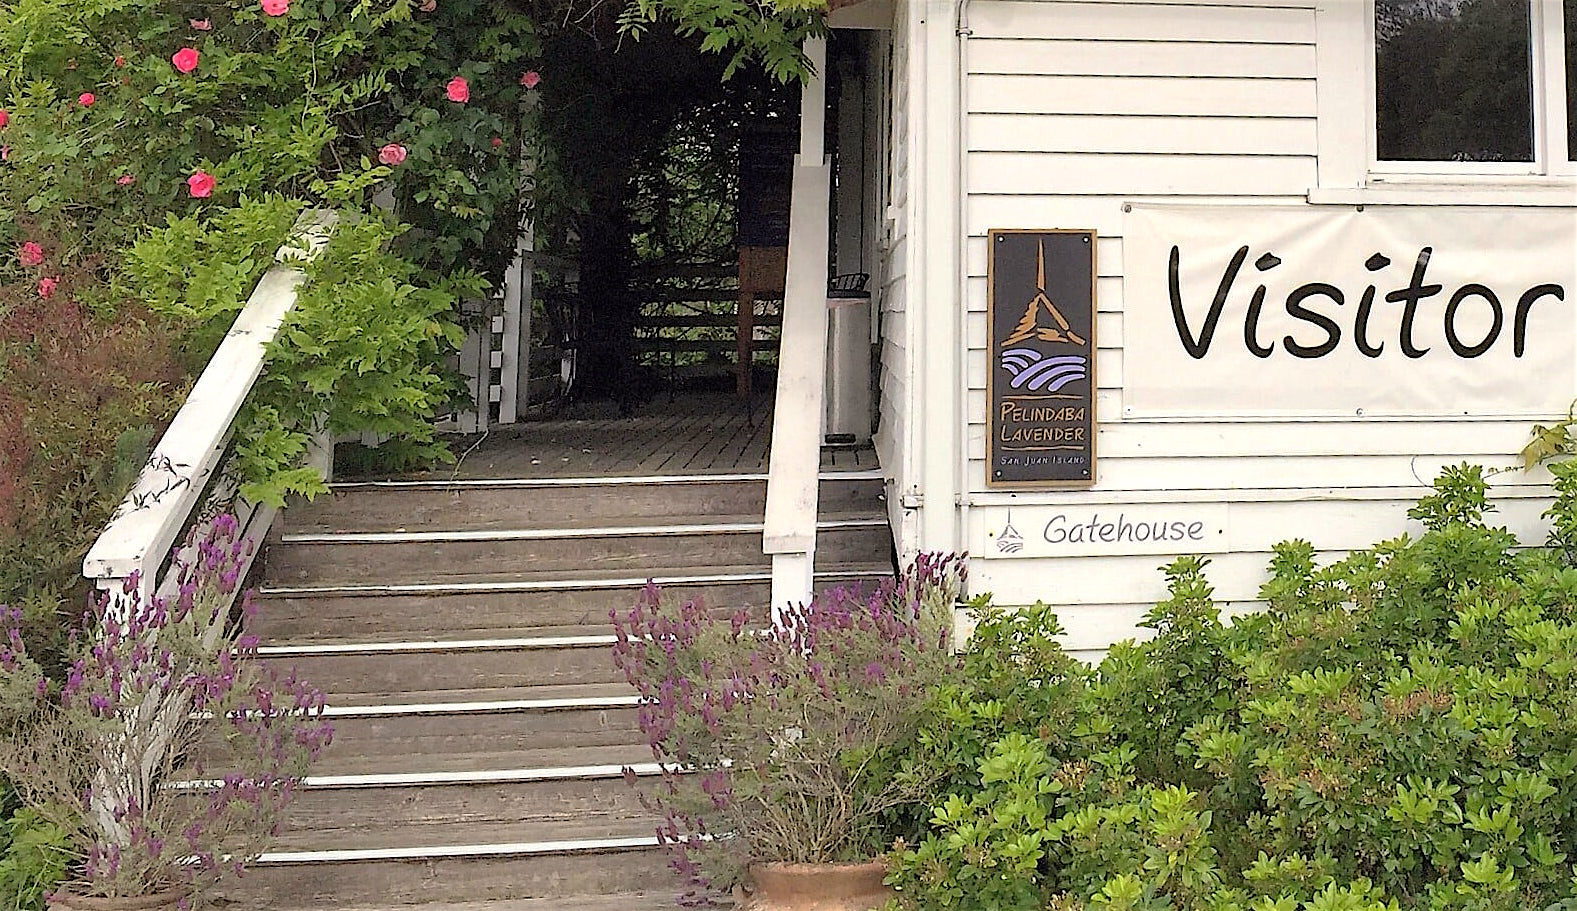 The Gatehouse Farm Store and Visitor Center at the Pelindaba Lavender Farm